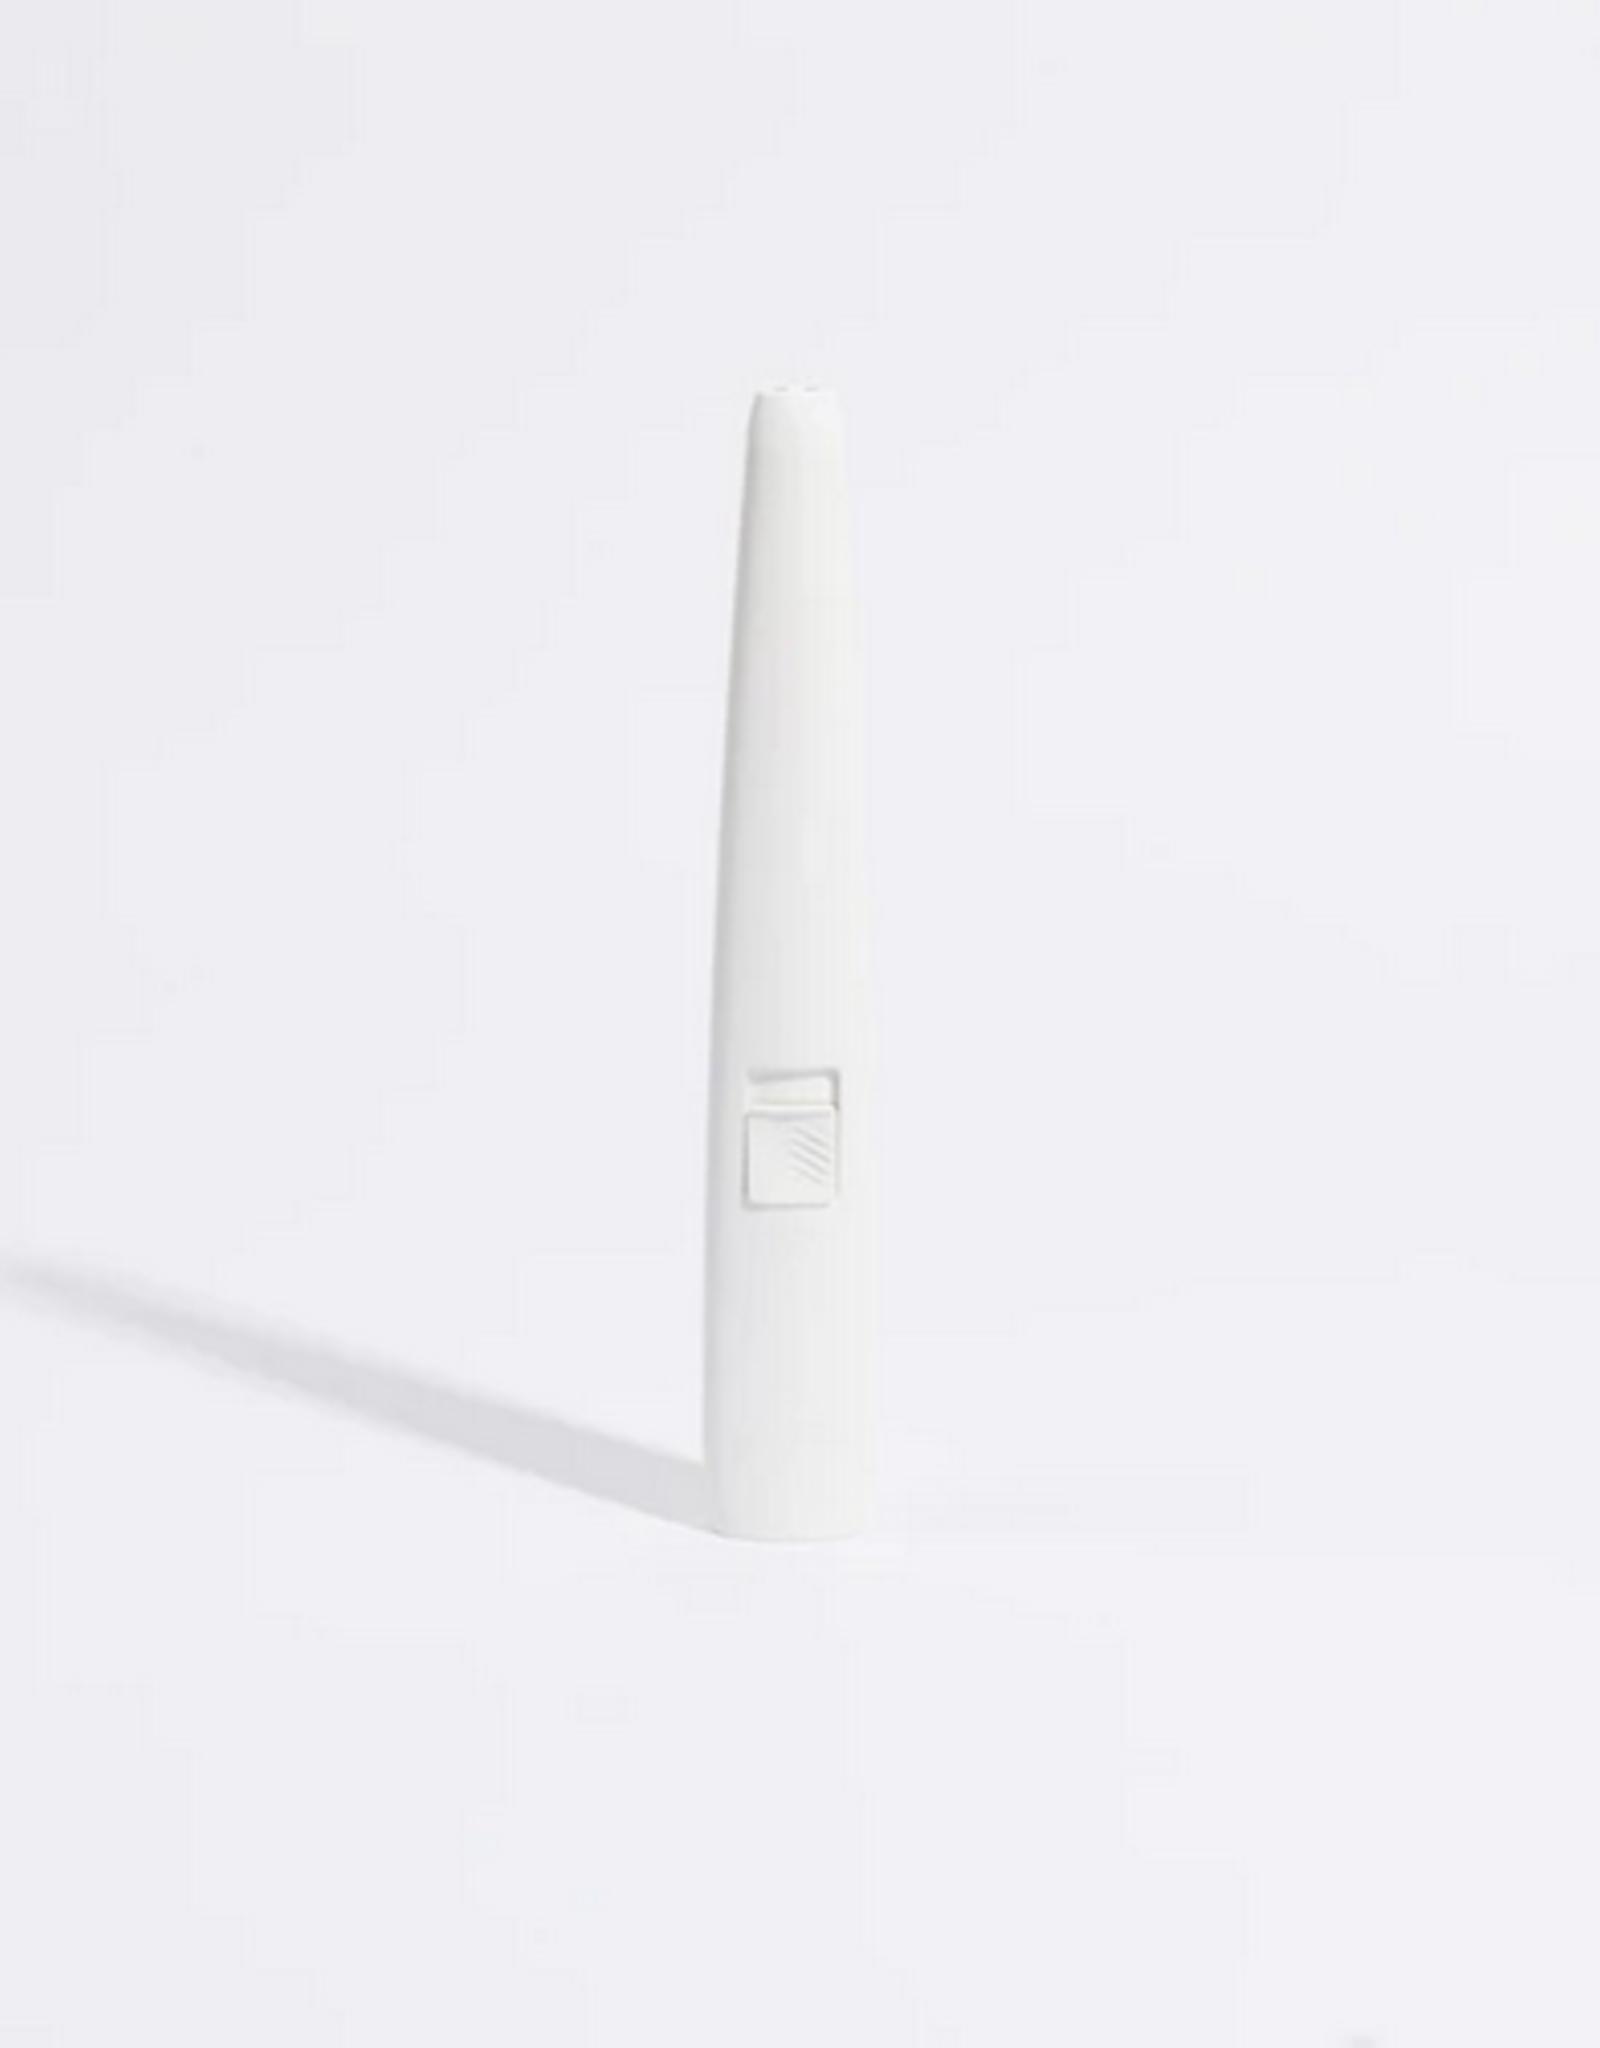 USB Lighter Company The Motli Light